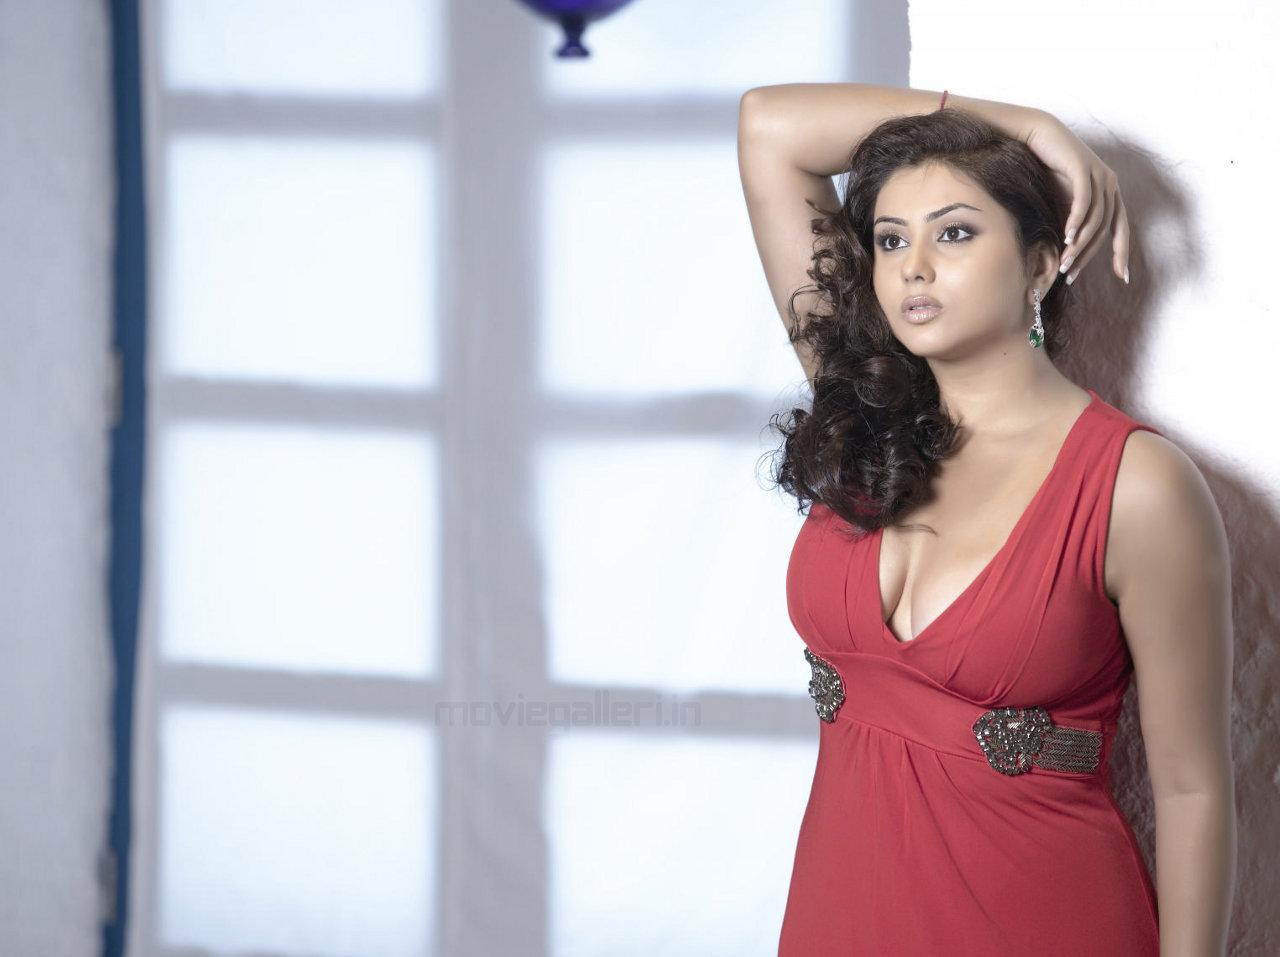 Hd Wallpaper Tamil Actress - Namitha Hot In Saree , HD Wallpaper & Backgrounds